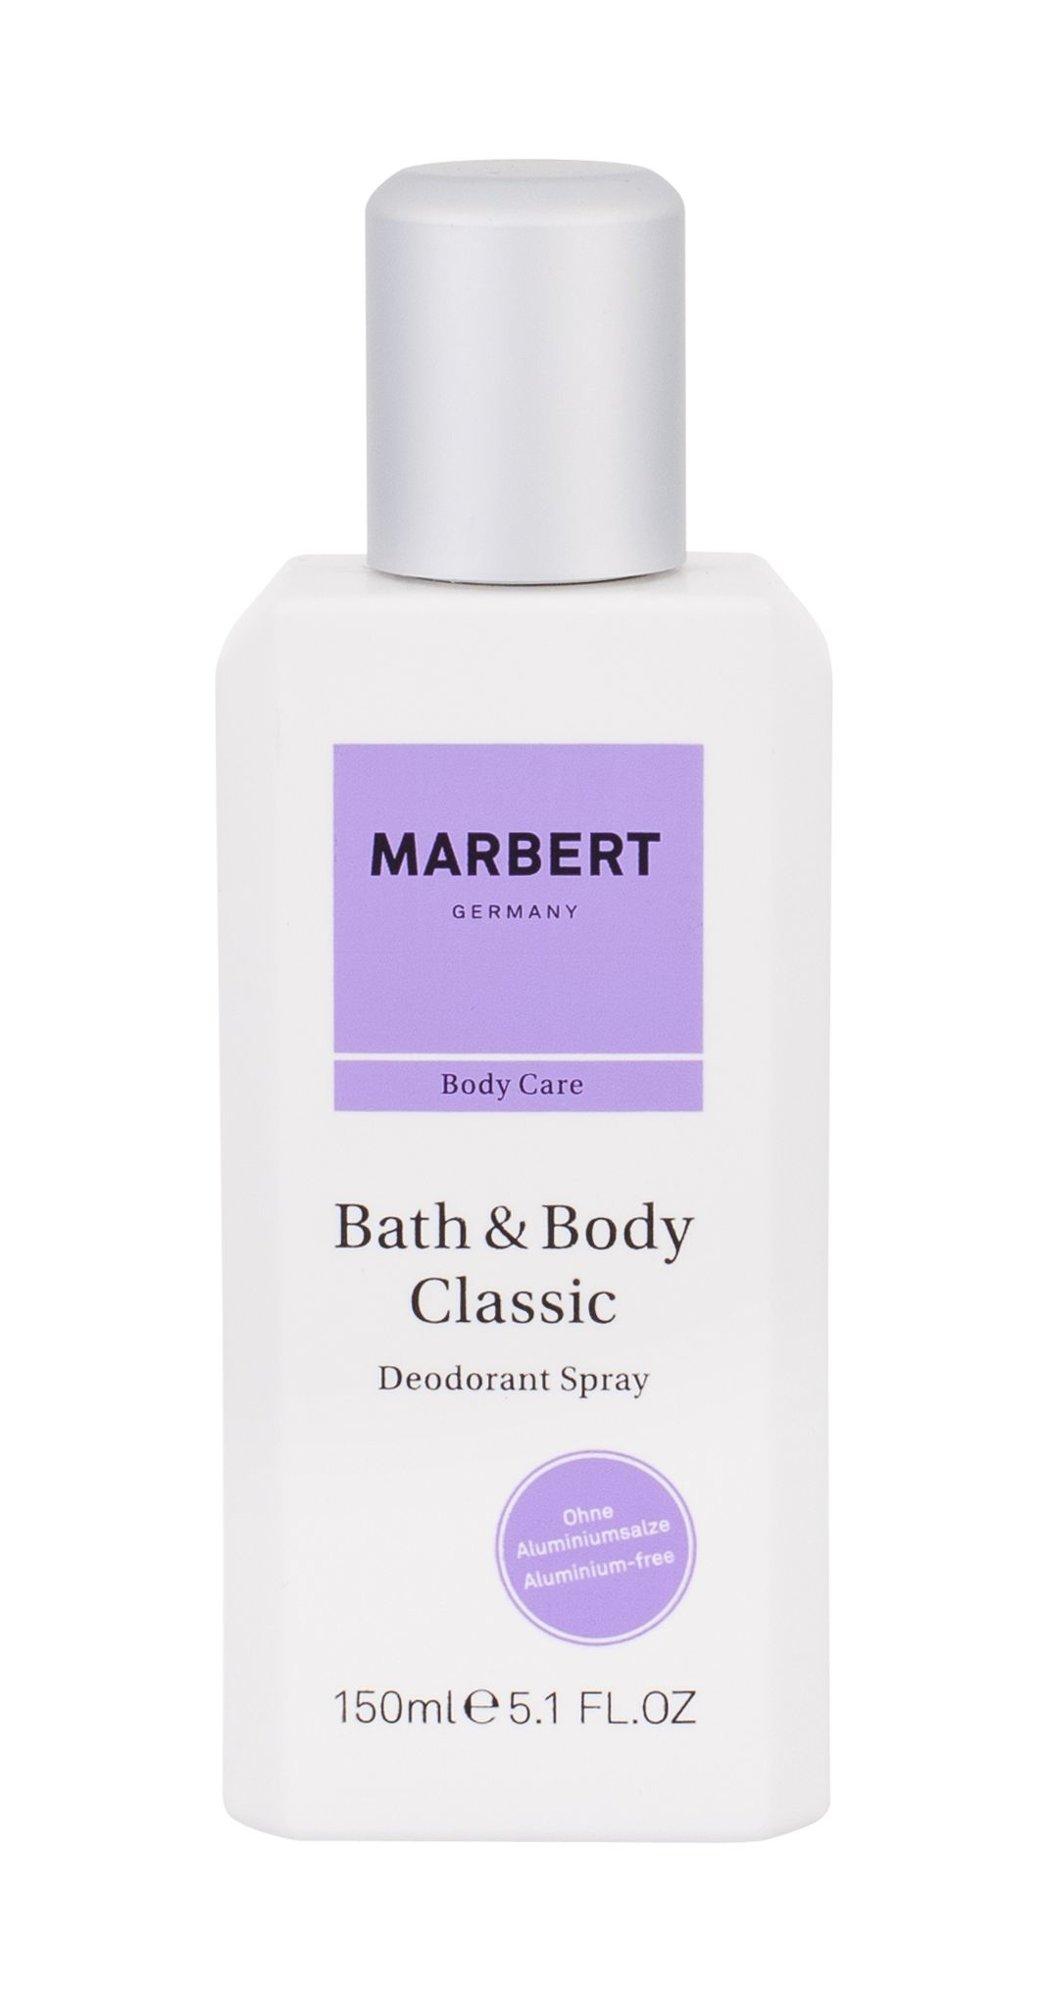 Marbert Bath & Body Classic Deodorant 150ml